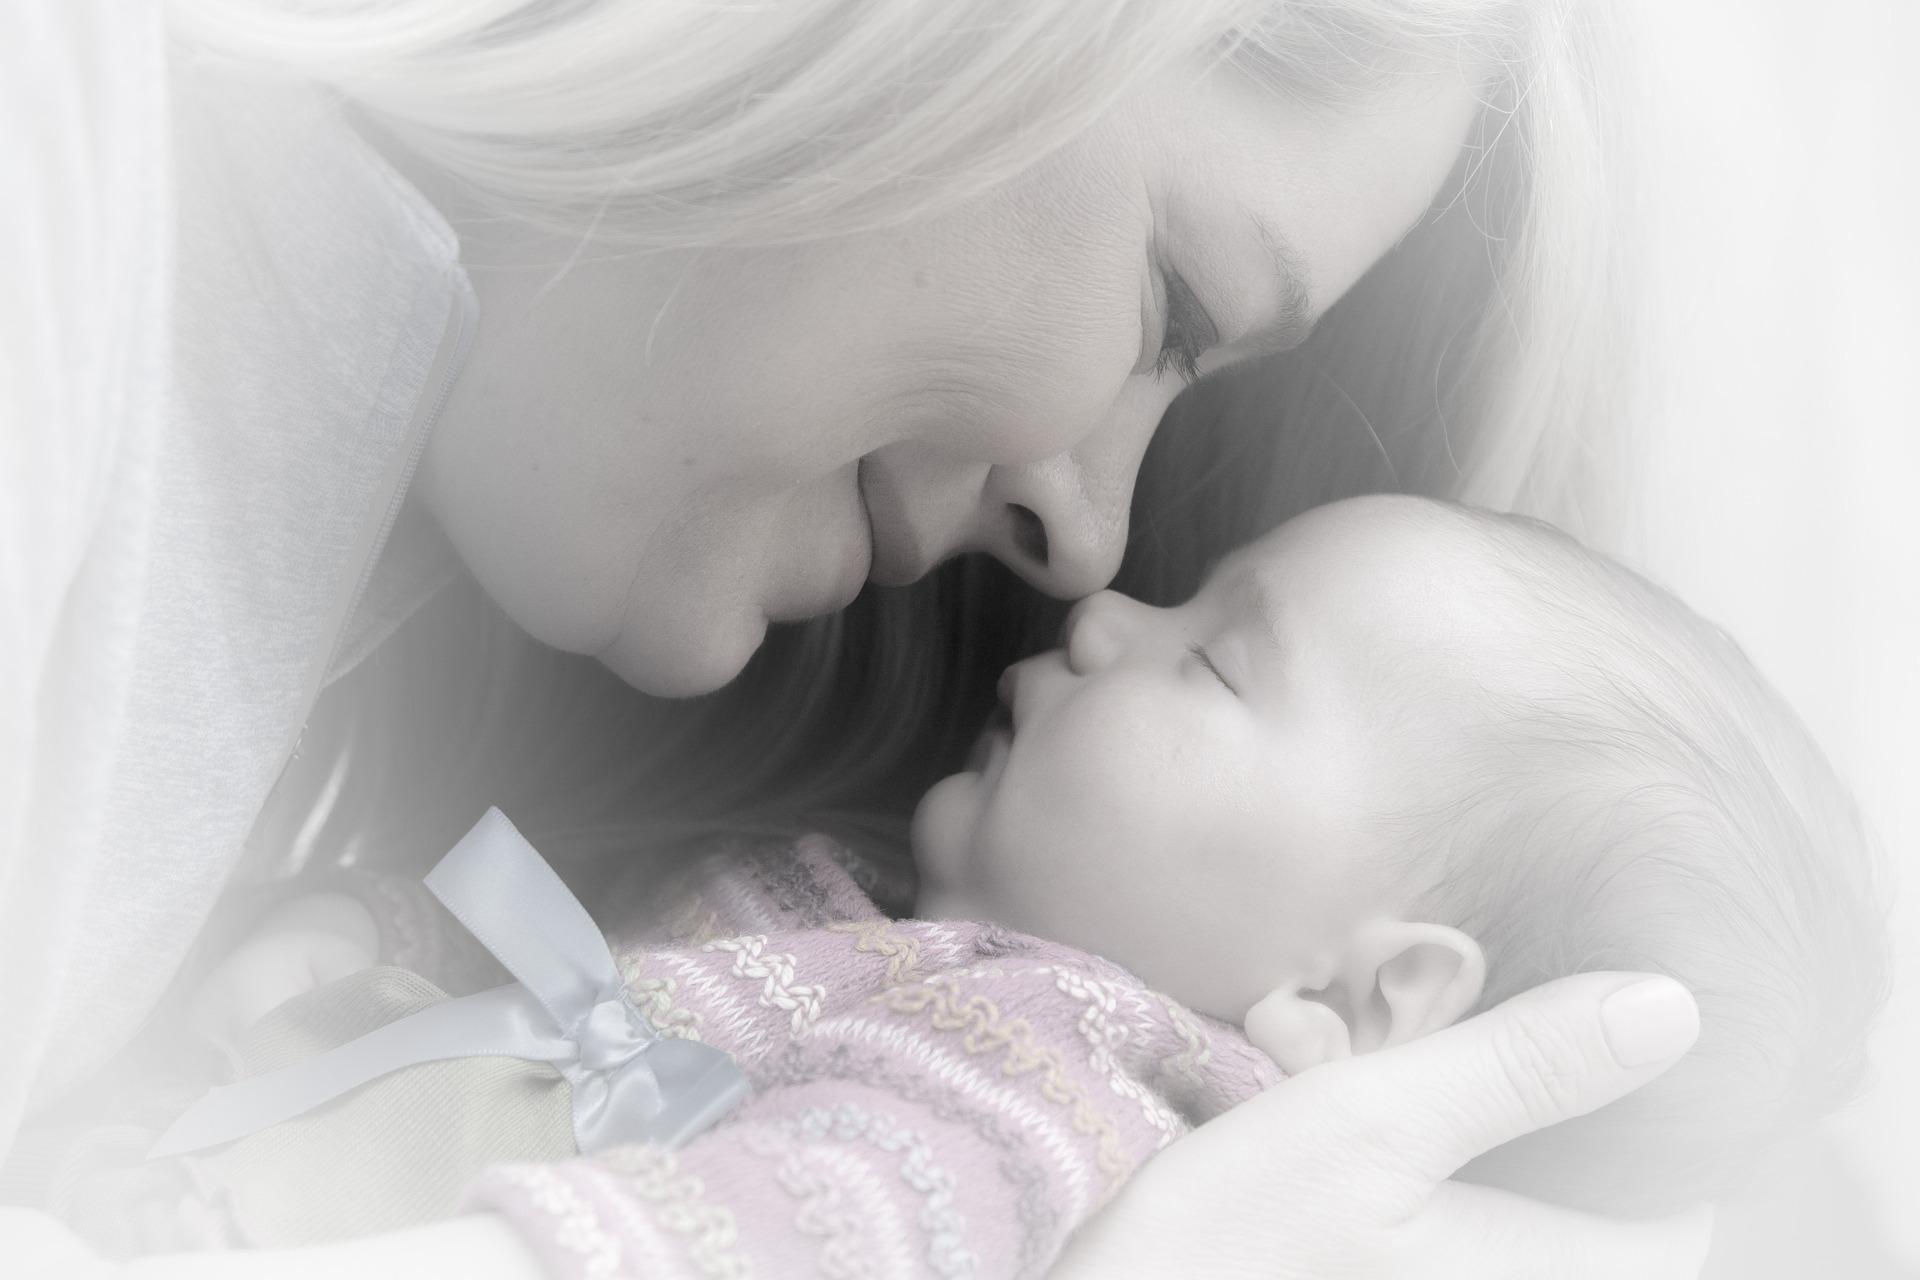 newborn-659685_1920